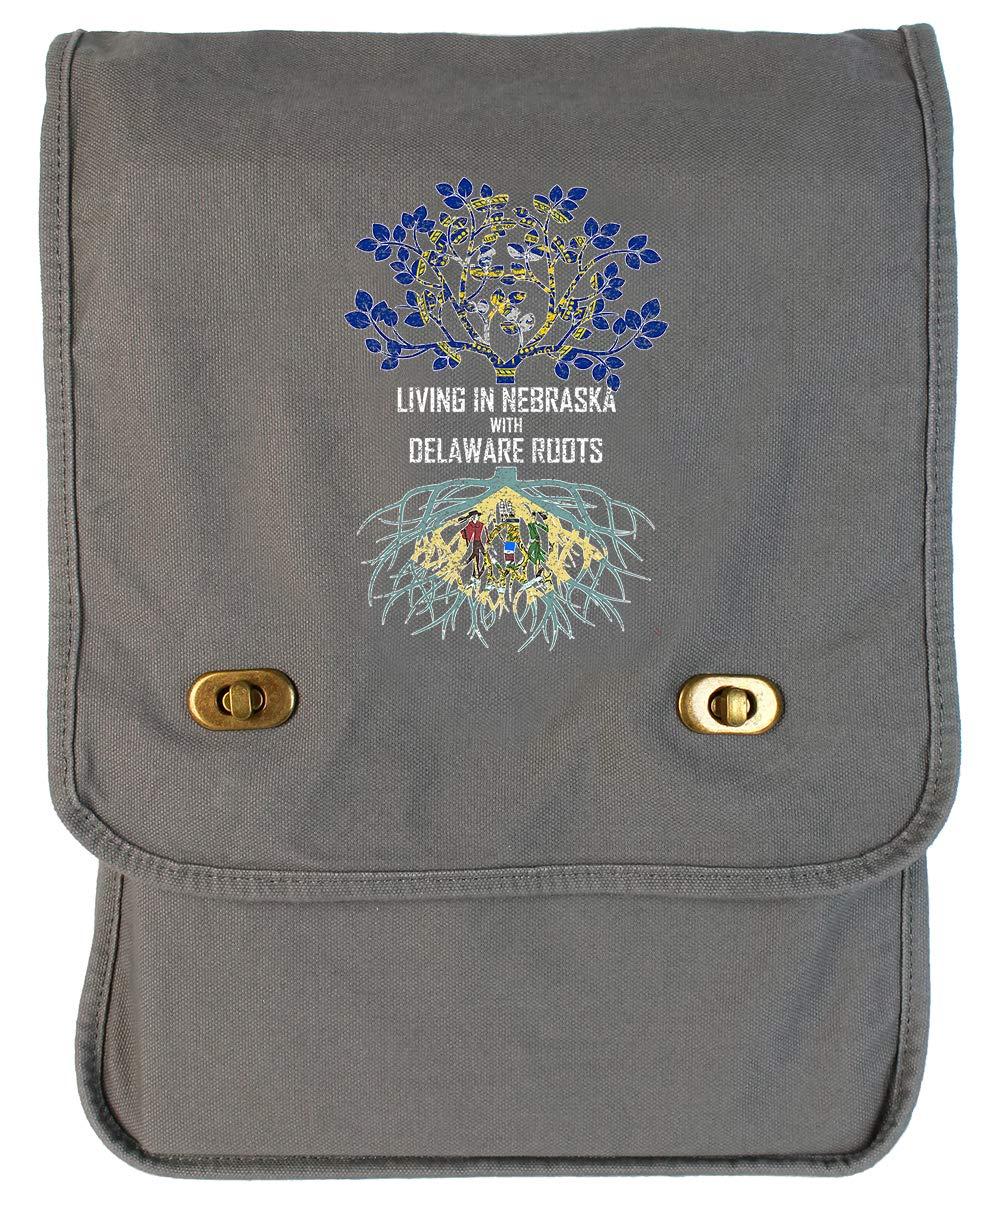 Tenacitee Living In Nebraska with Delaware Roots Grey Brushed Canvas Messenger Bag